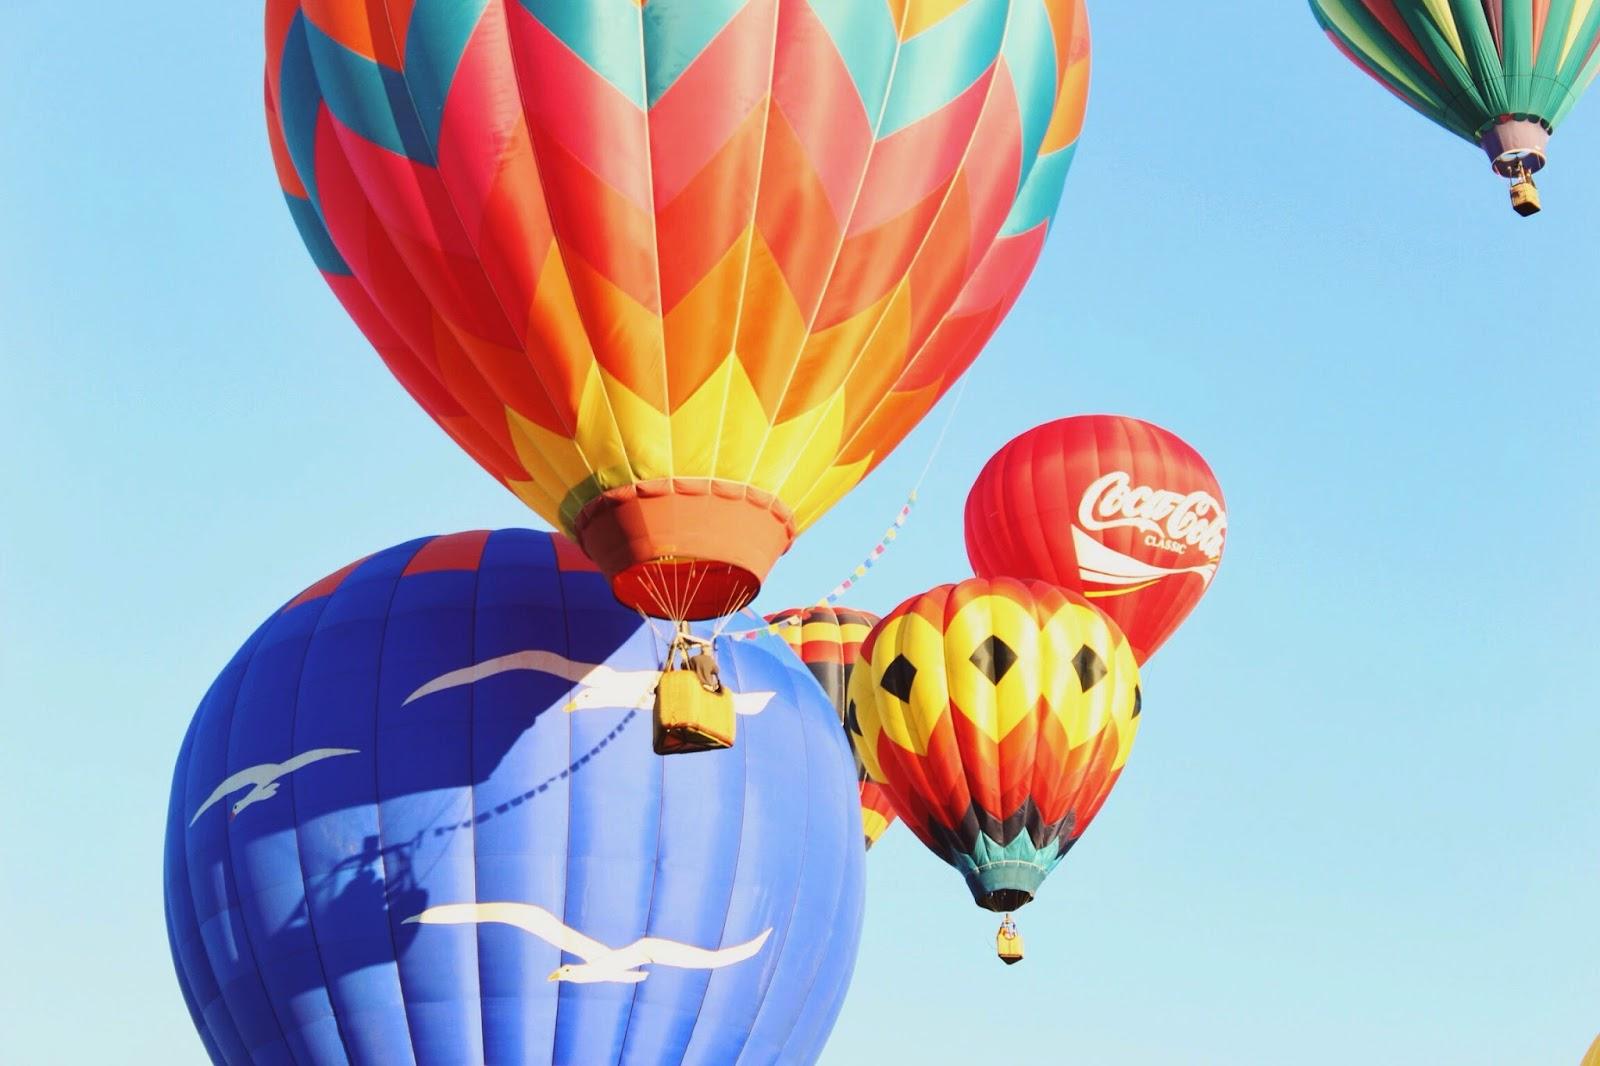 hot%2Bair%2Bballon%2Bwith%2Bflags.jpg